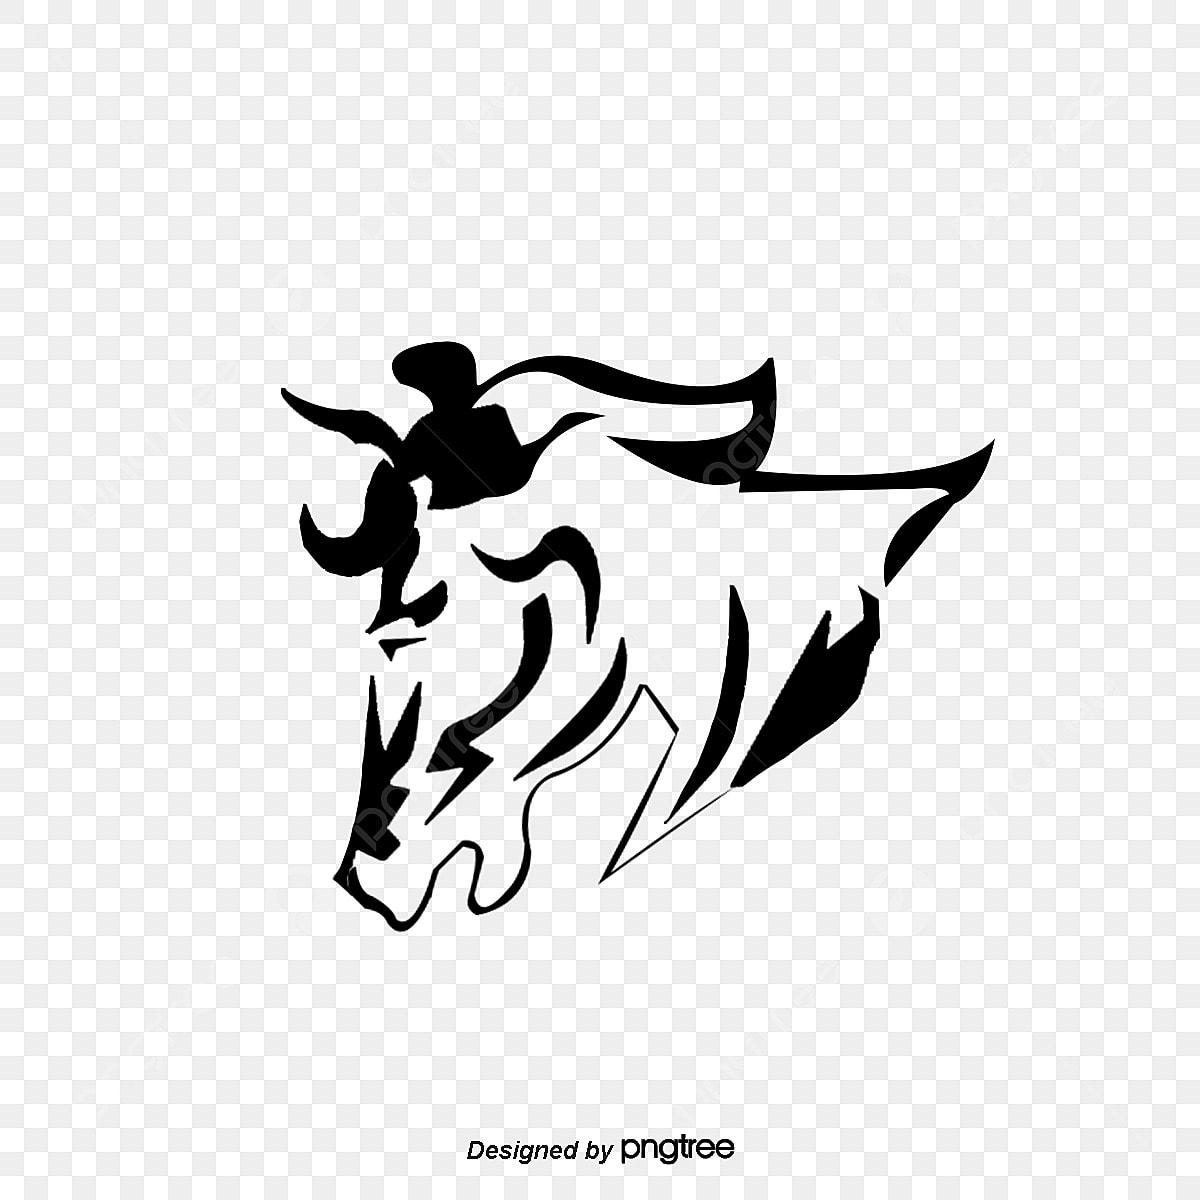 Vektor Garis Hitam Kuda Kreatif Vektor Kuda Kepala Kuda